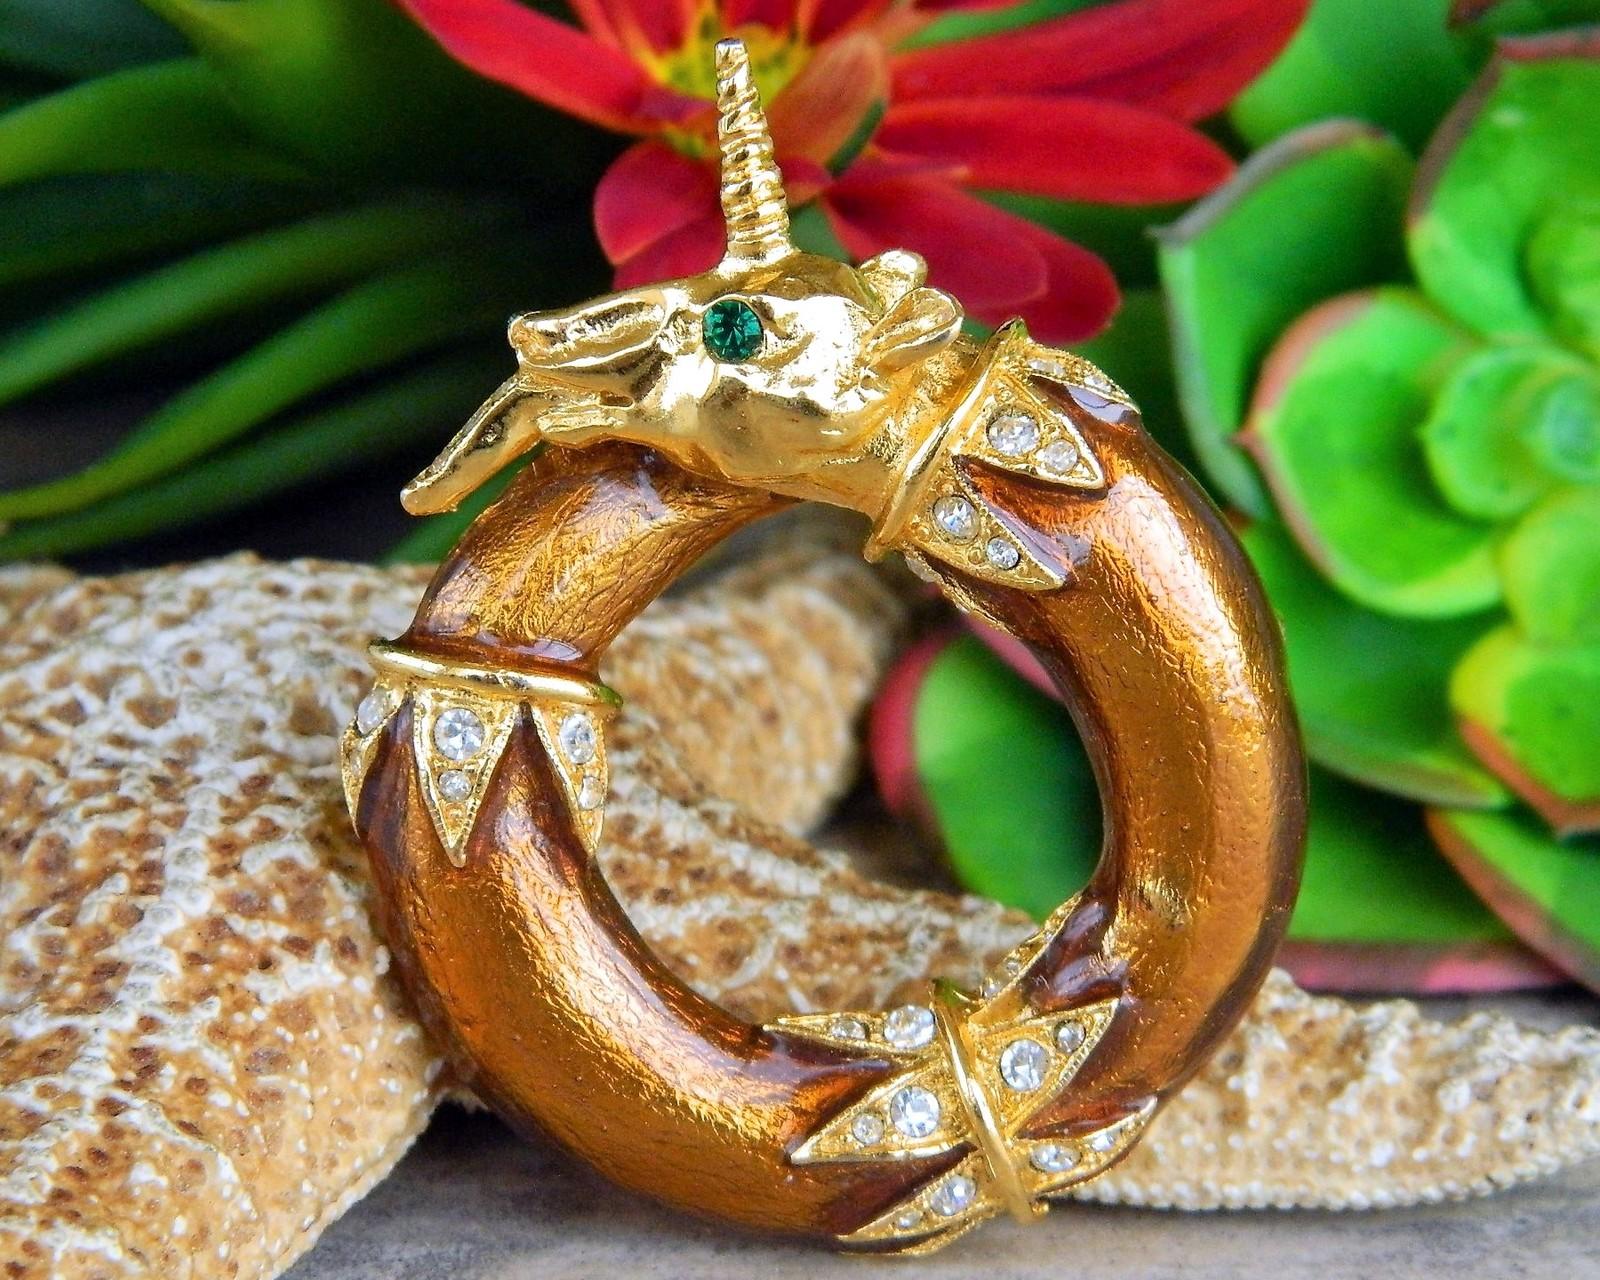 Vintage Unicorn Alexis Kirk Brooch Pin Pendant Enamel Rhinestones